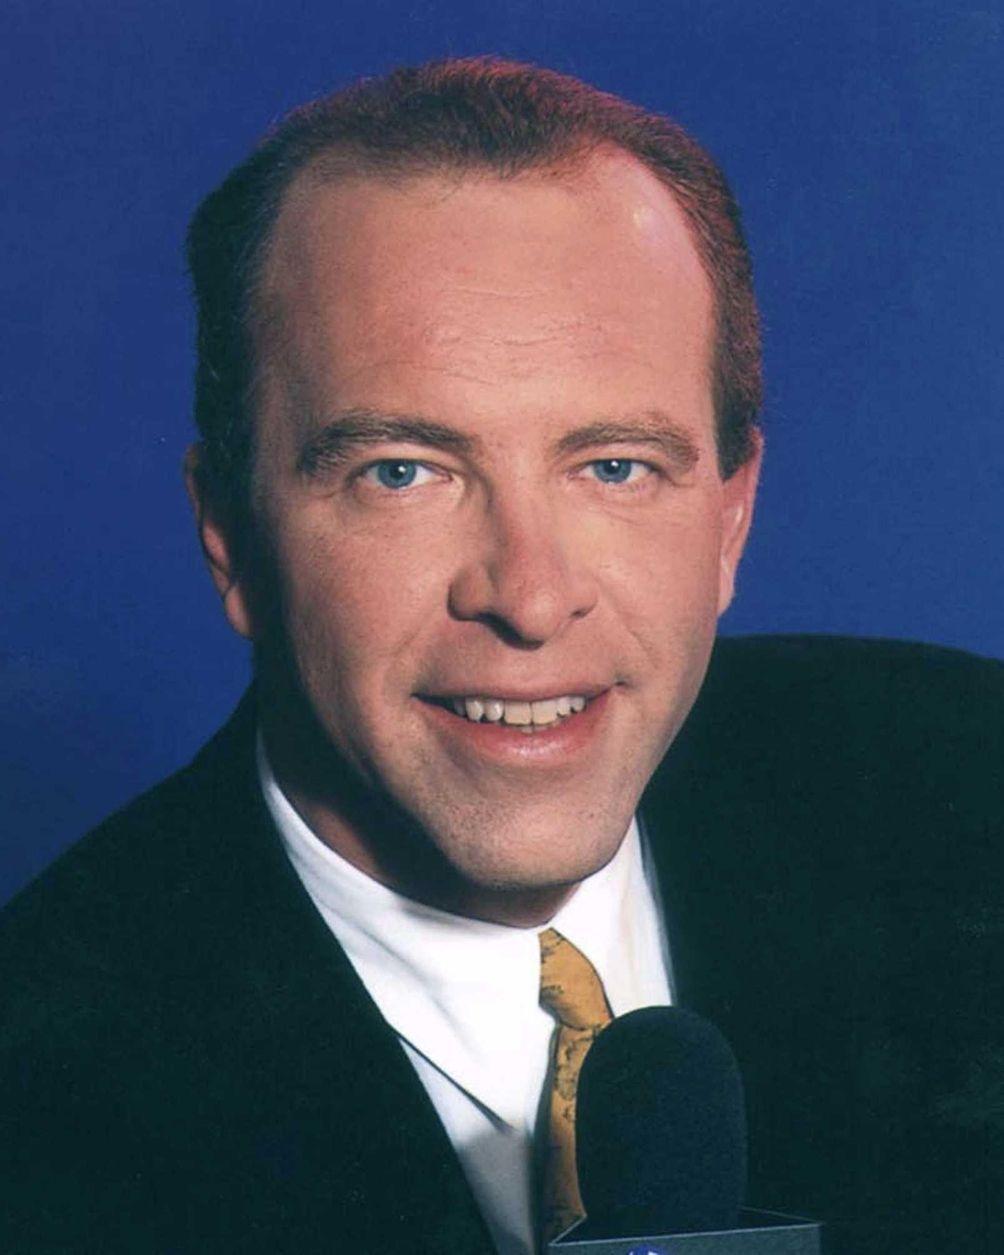 Emmy-award winning MSG sports broadcaster/TV host Al Trautwig